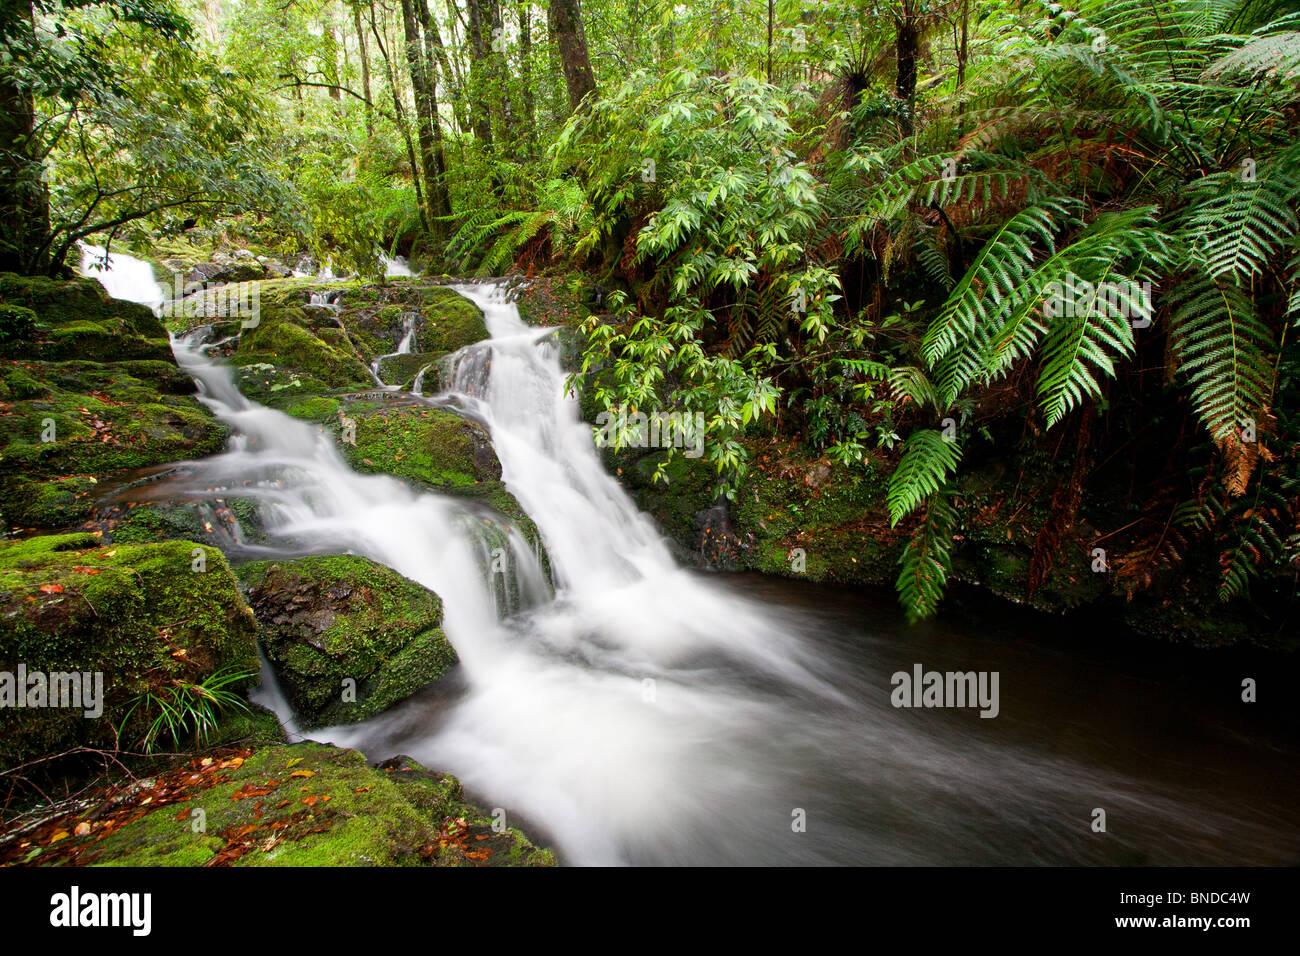 Flowing stream in temperate rainforest, Barrington Tops National Park, Australia - Stock Image